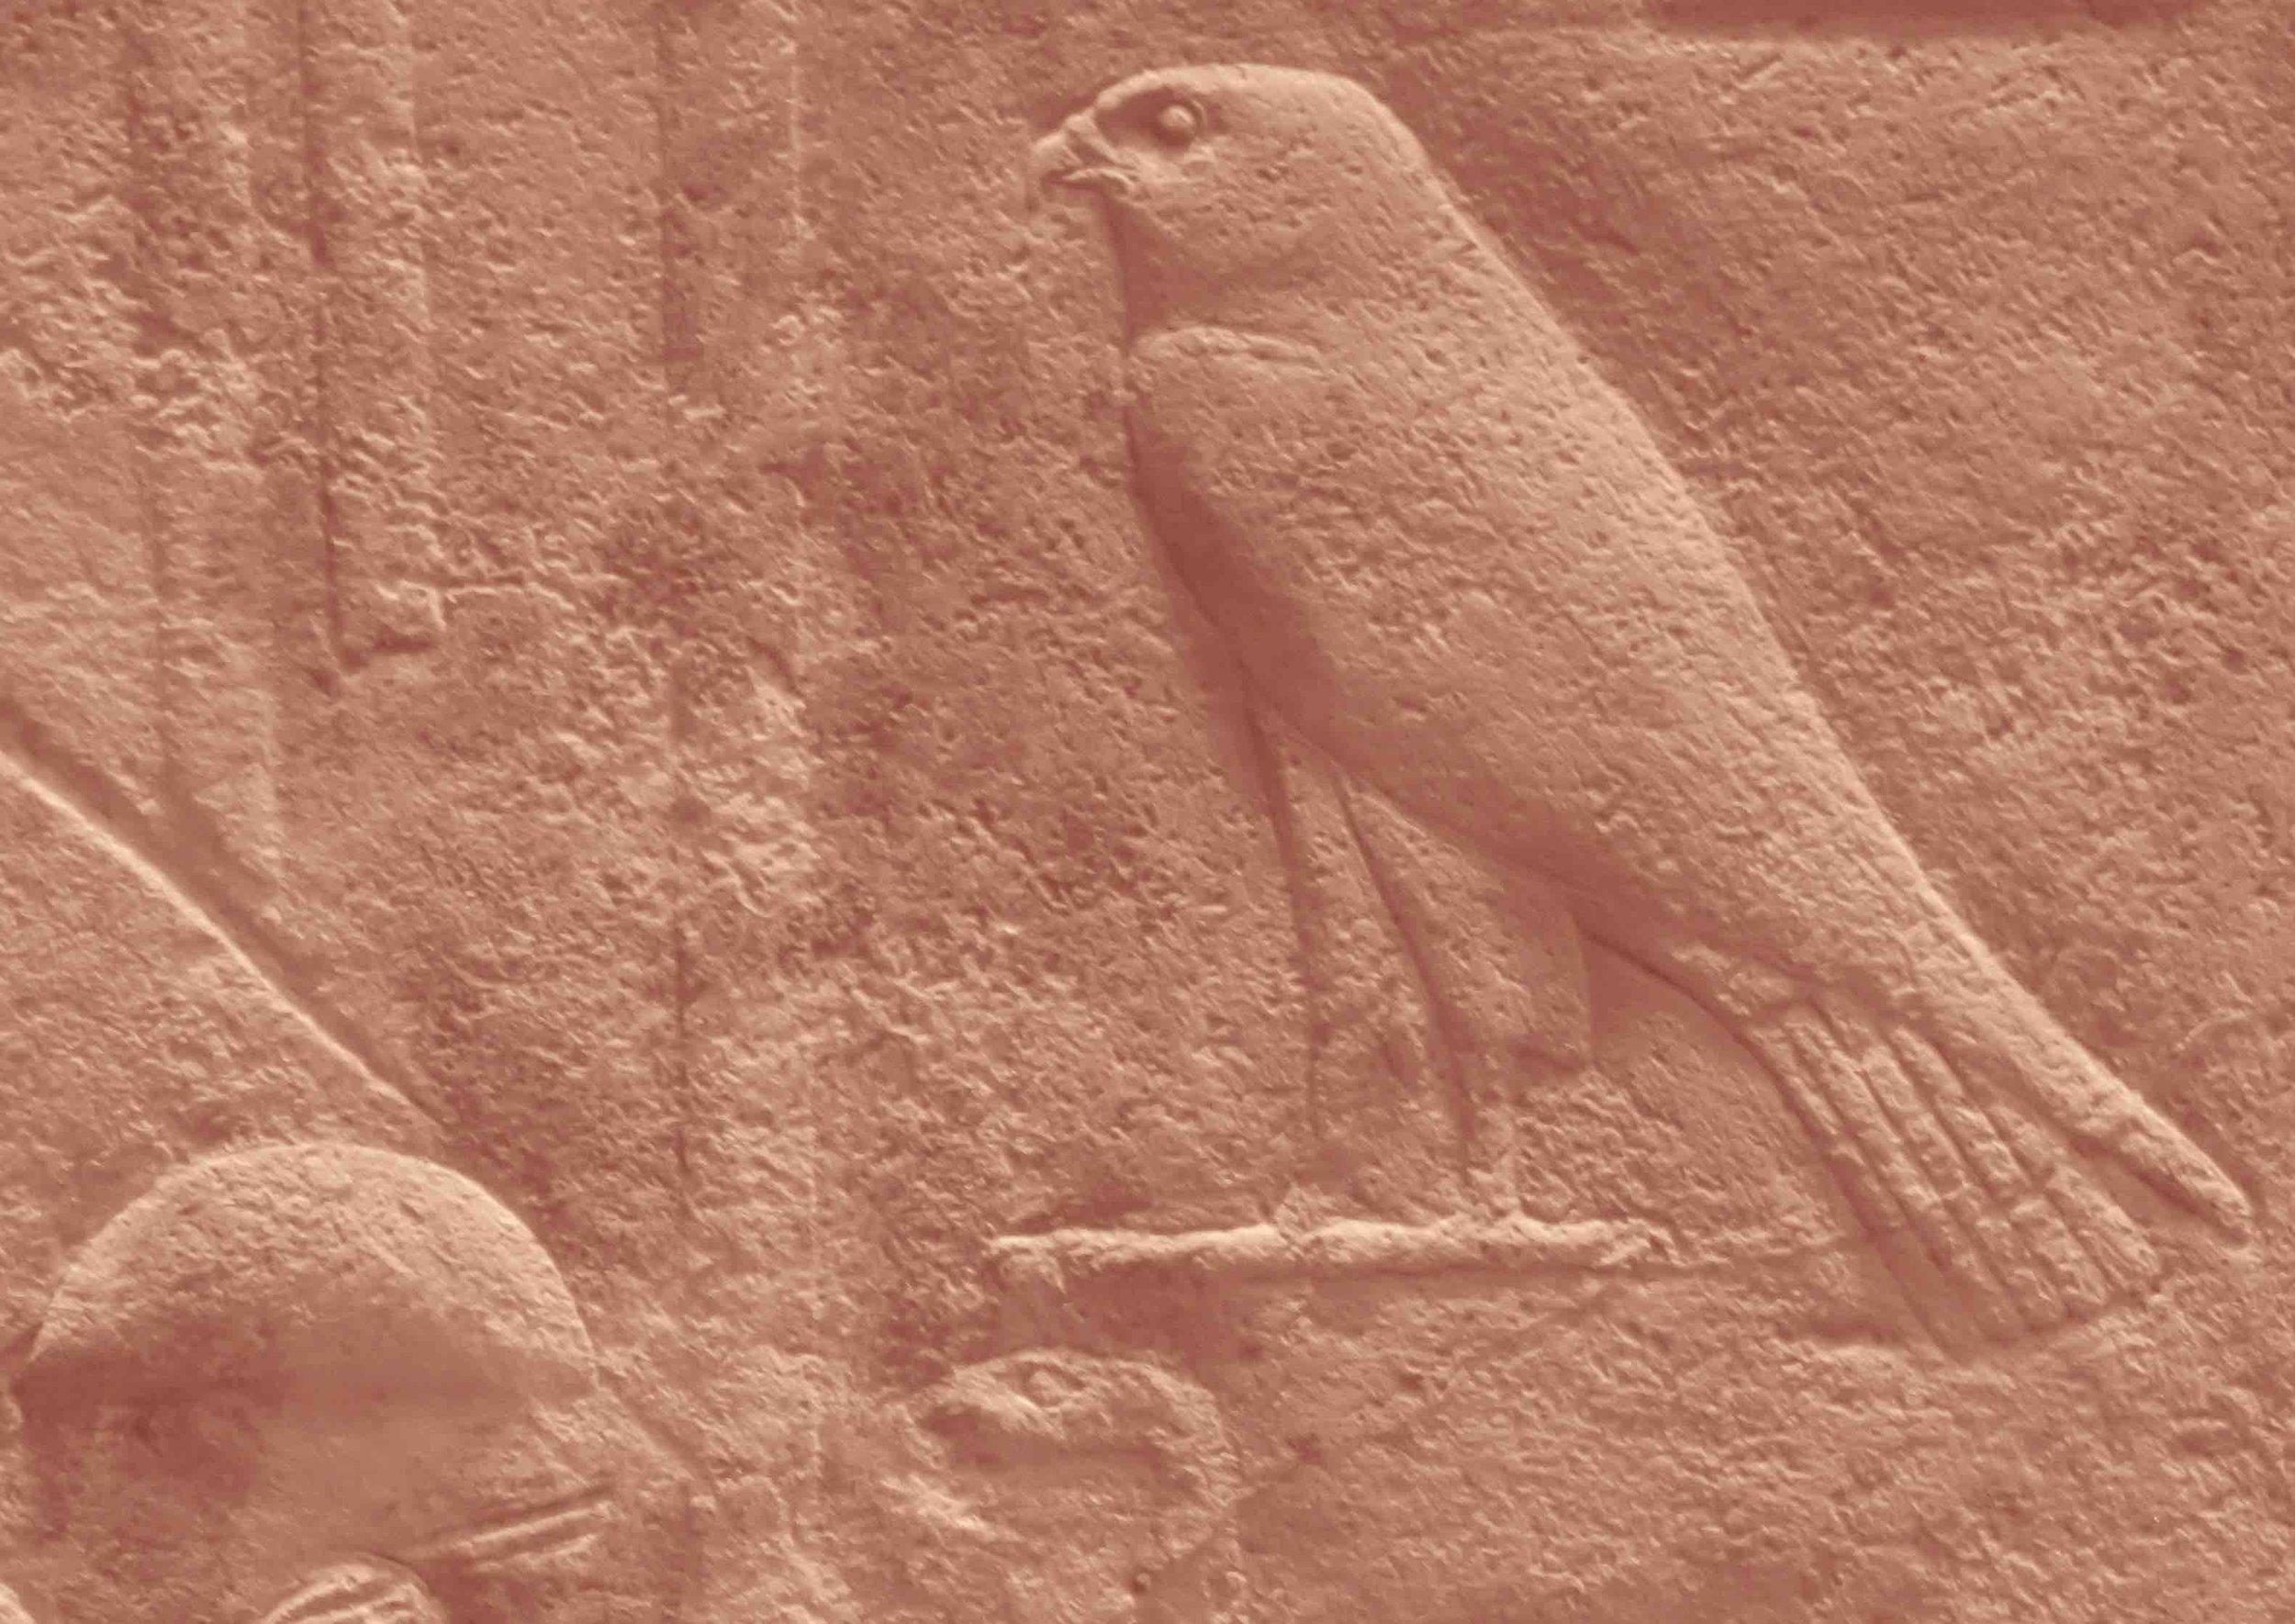 Un faucon, Horus, déifié pour son regard perçant.